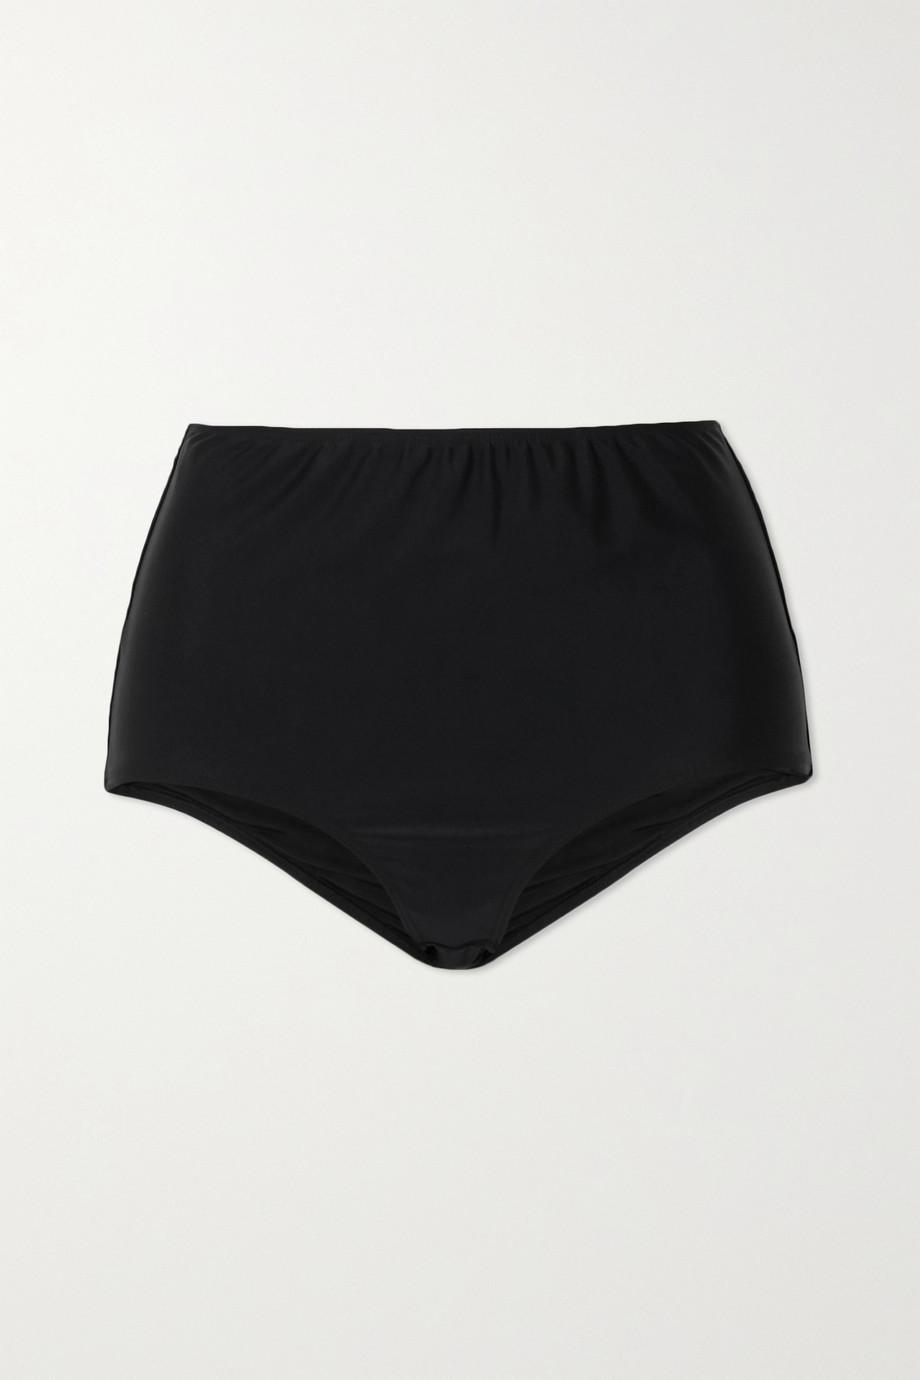 Cover + NET SUSTAIN stretch bikini briefs